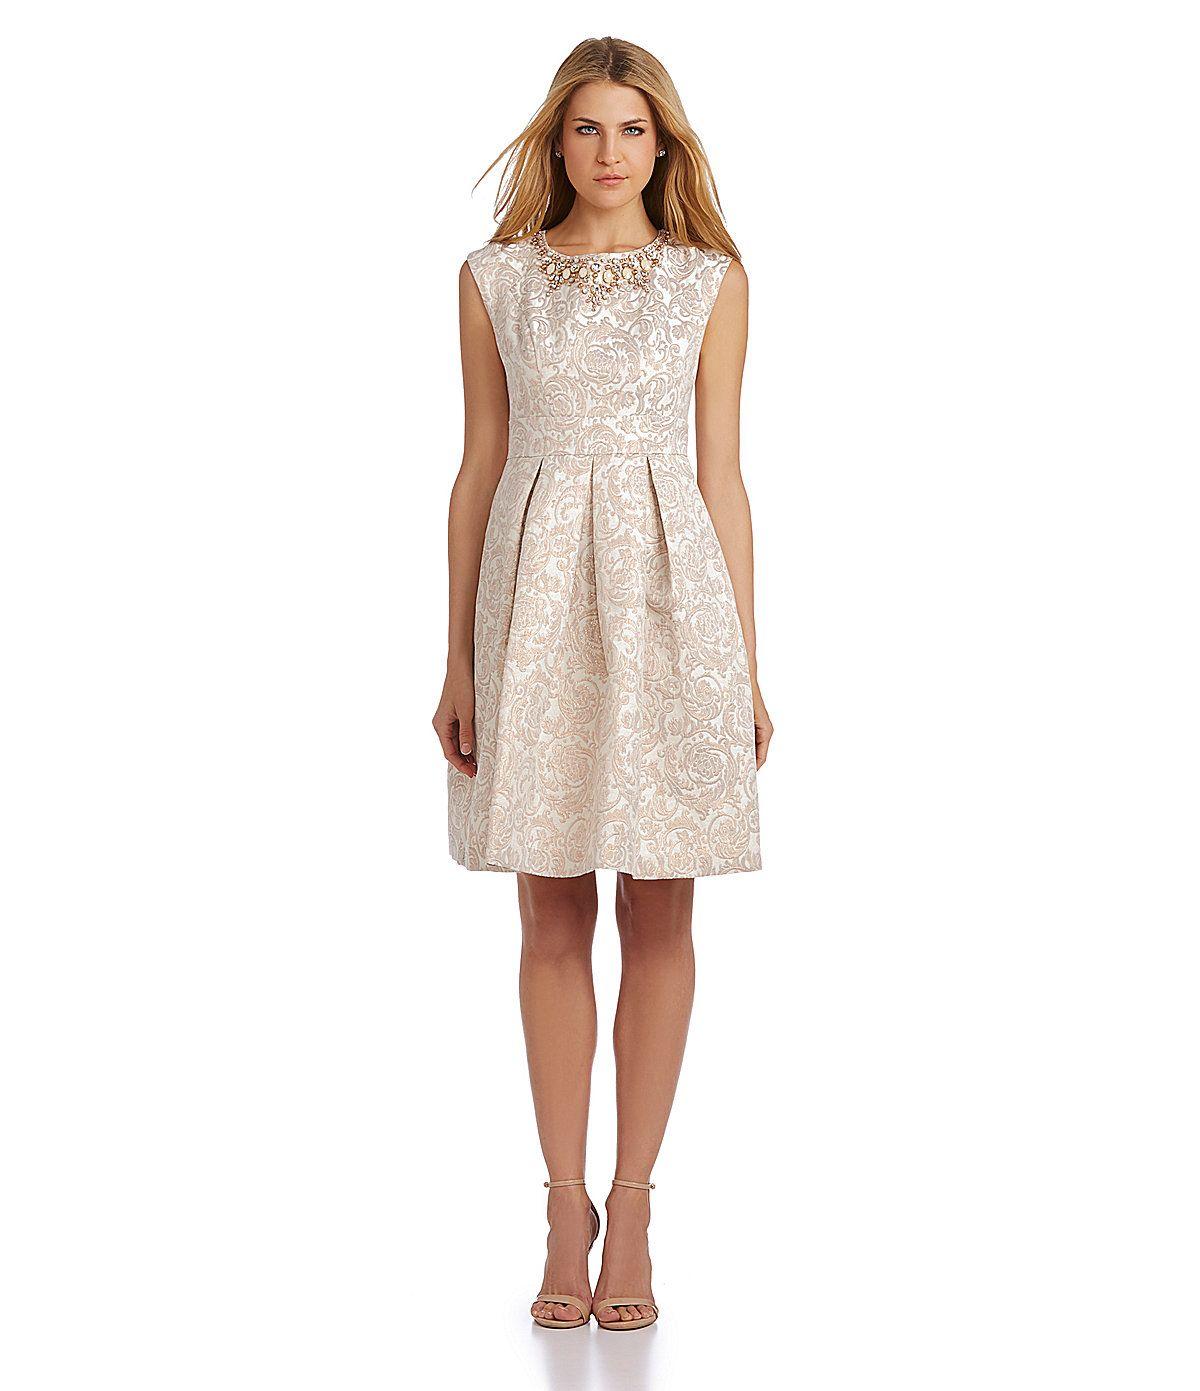 Eliza j beaded jacquard fit and flare dress dillards eliza j beaded jacquard fit and flare dress dillards ombrellifo Gallery